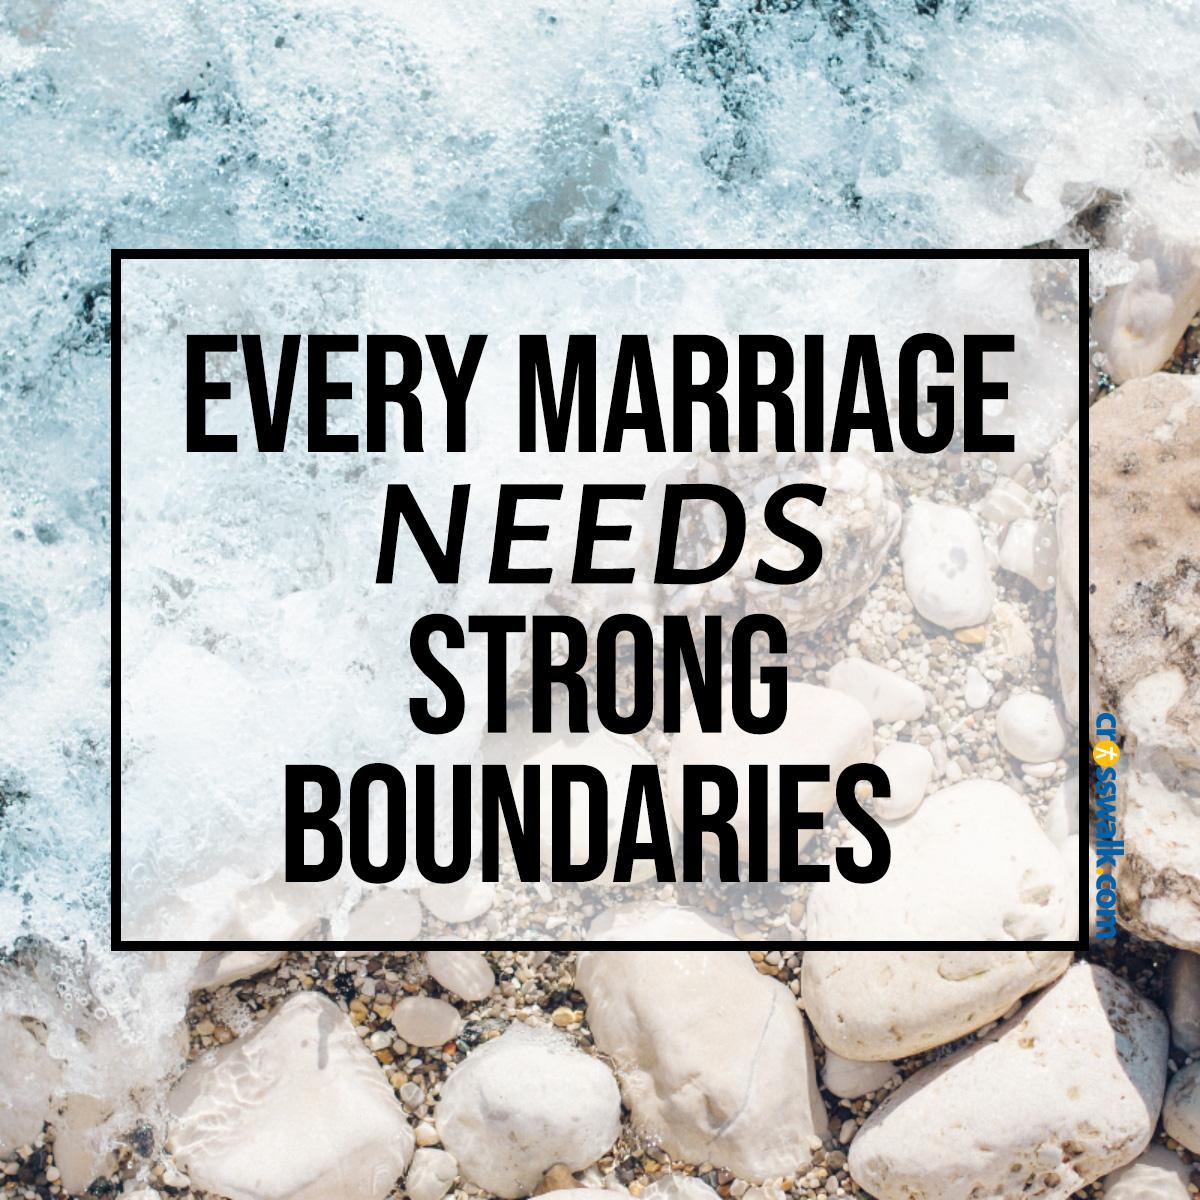 Marriage boundaries inspirational image